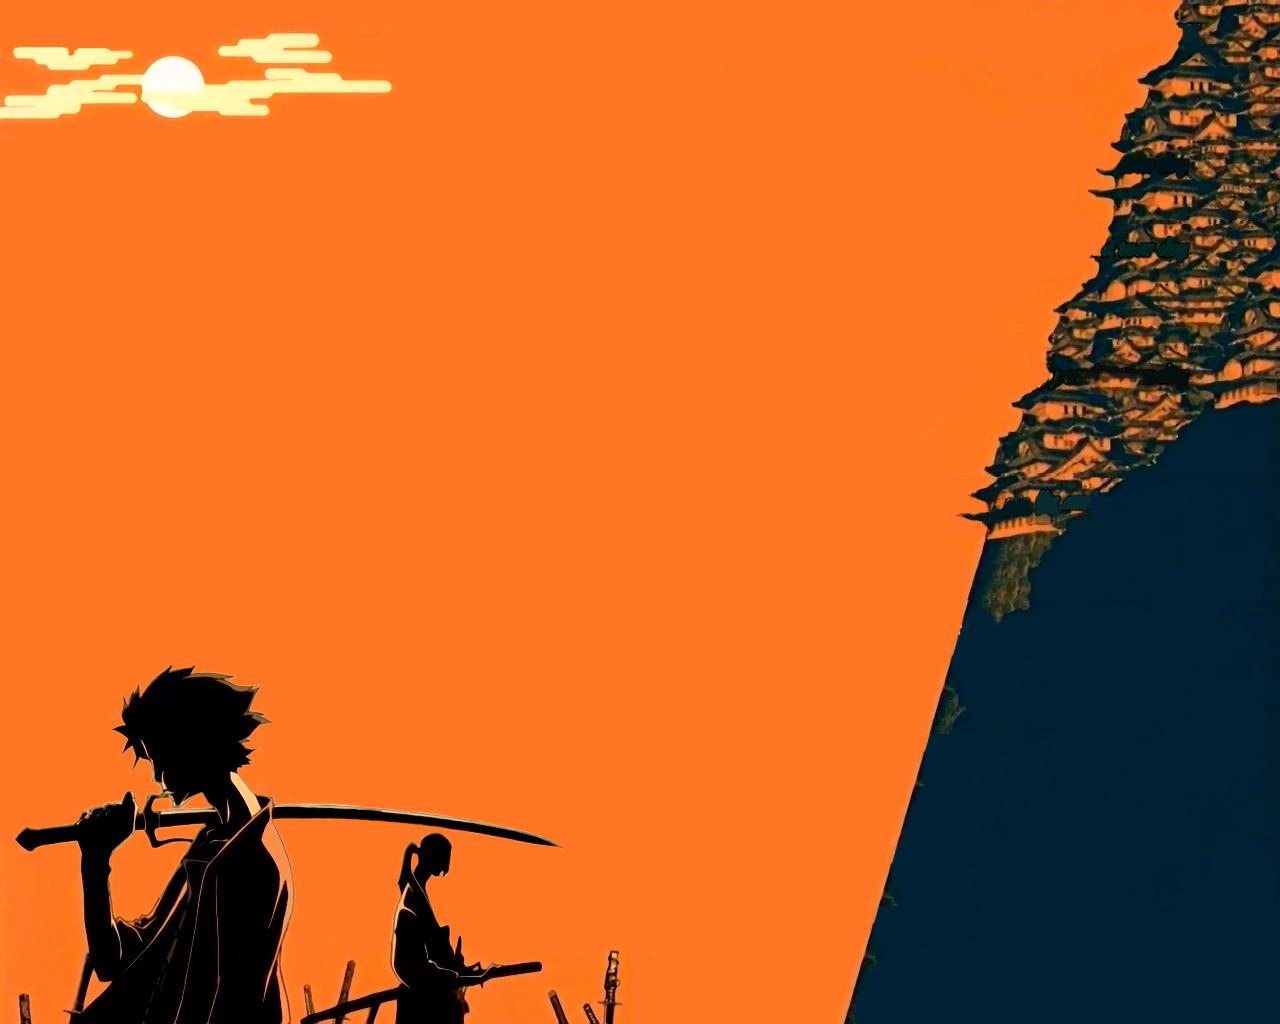 http://img07.deviantart.net/3929/i/2004/312/4/e/samurai_champloo_cliffs_by_little_moe.jpg